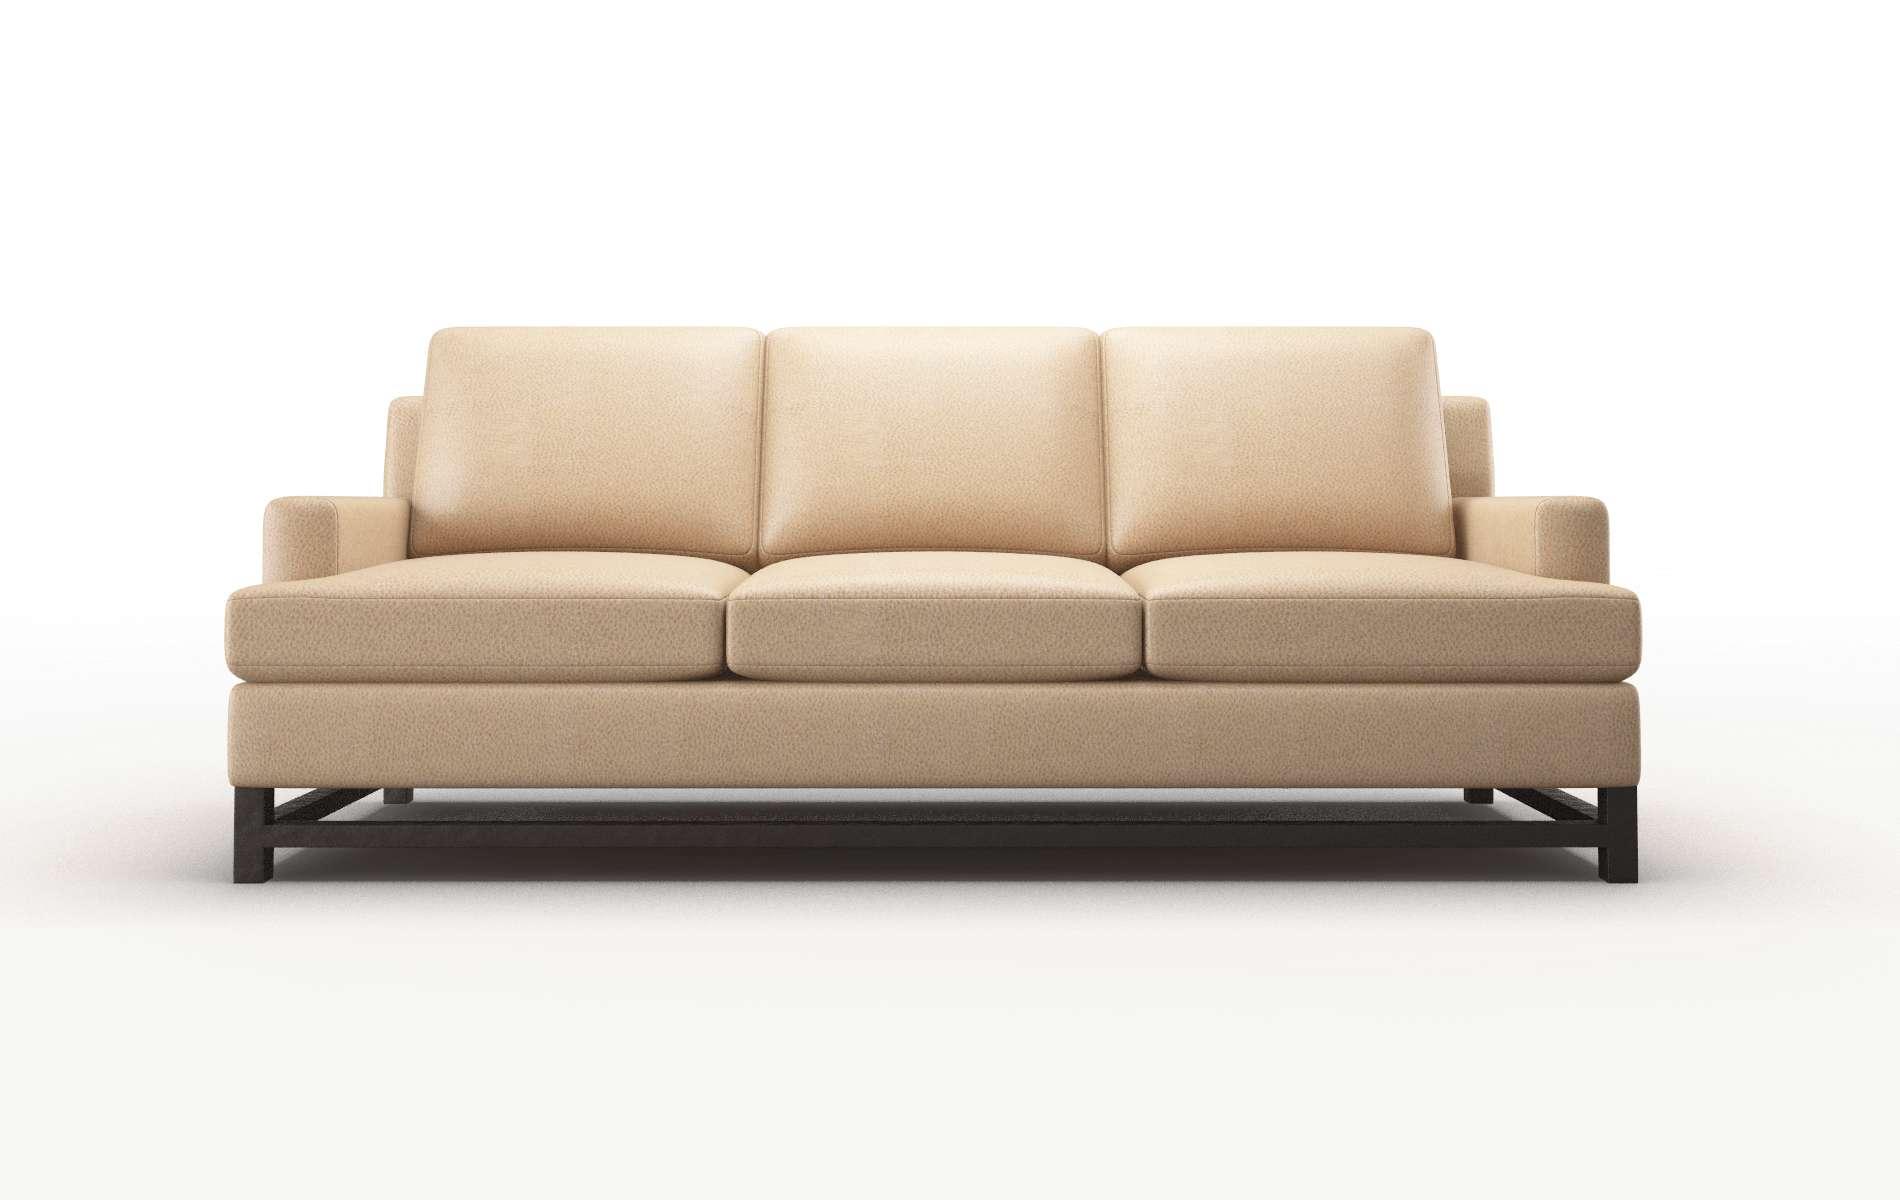 Houston Ford Dune Sofa espresso legs 1